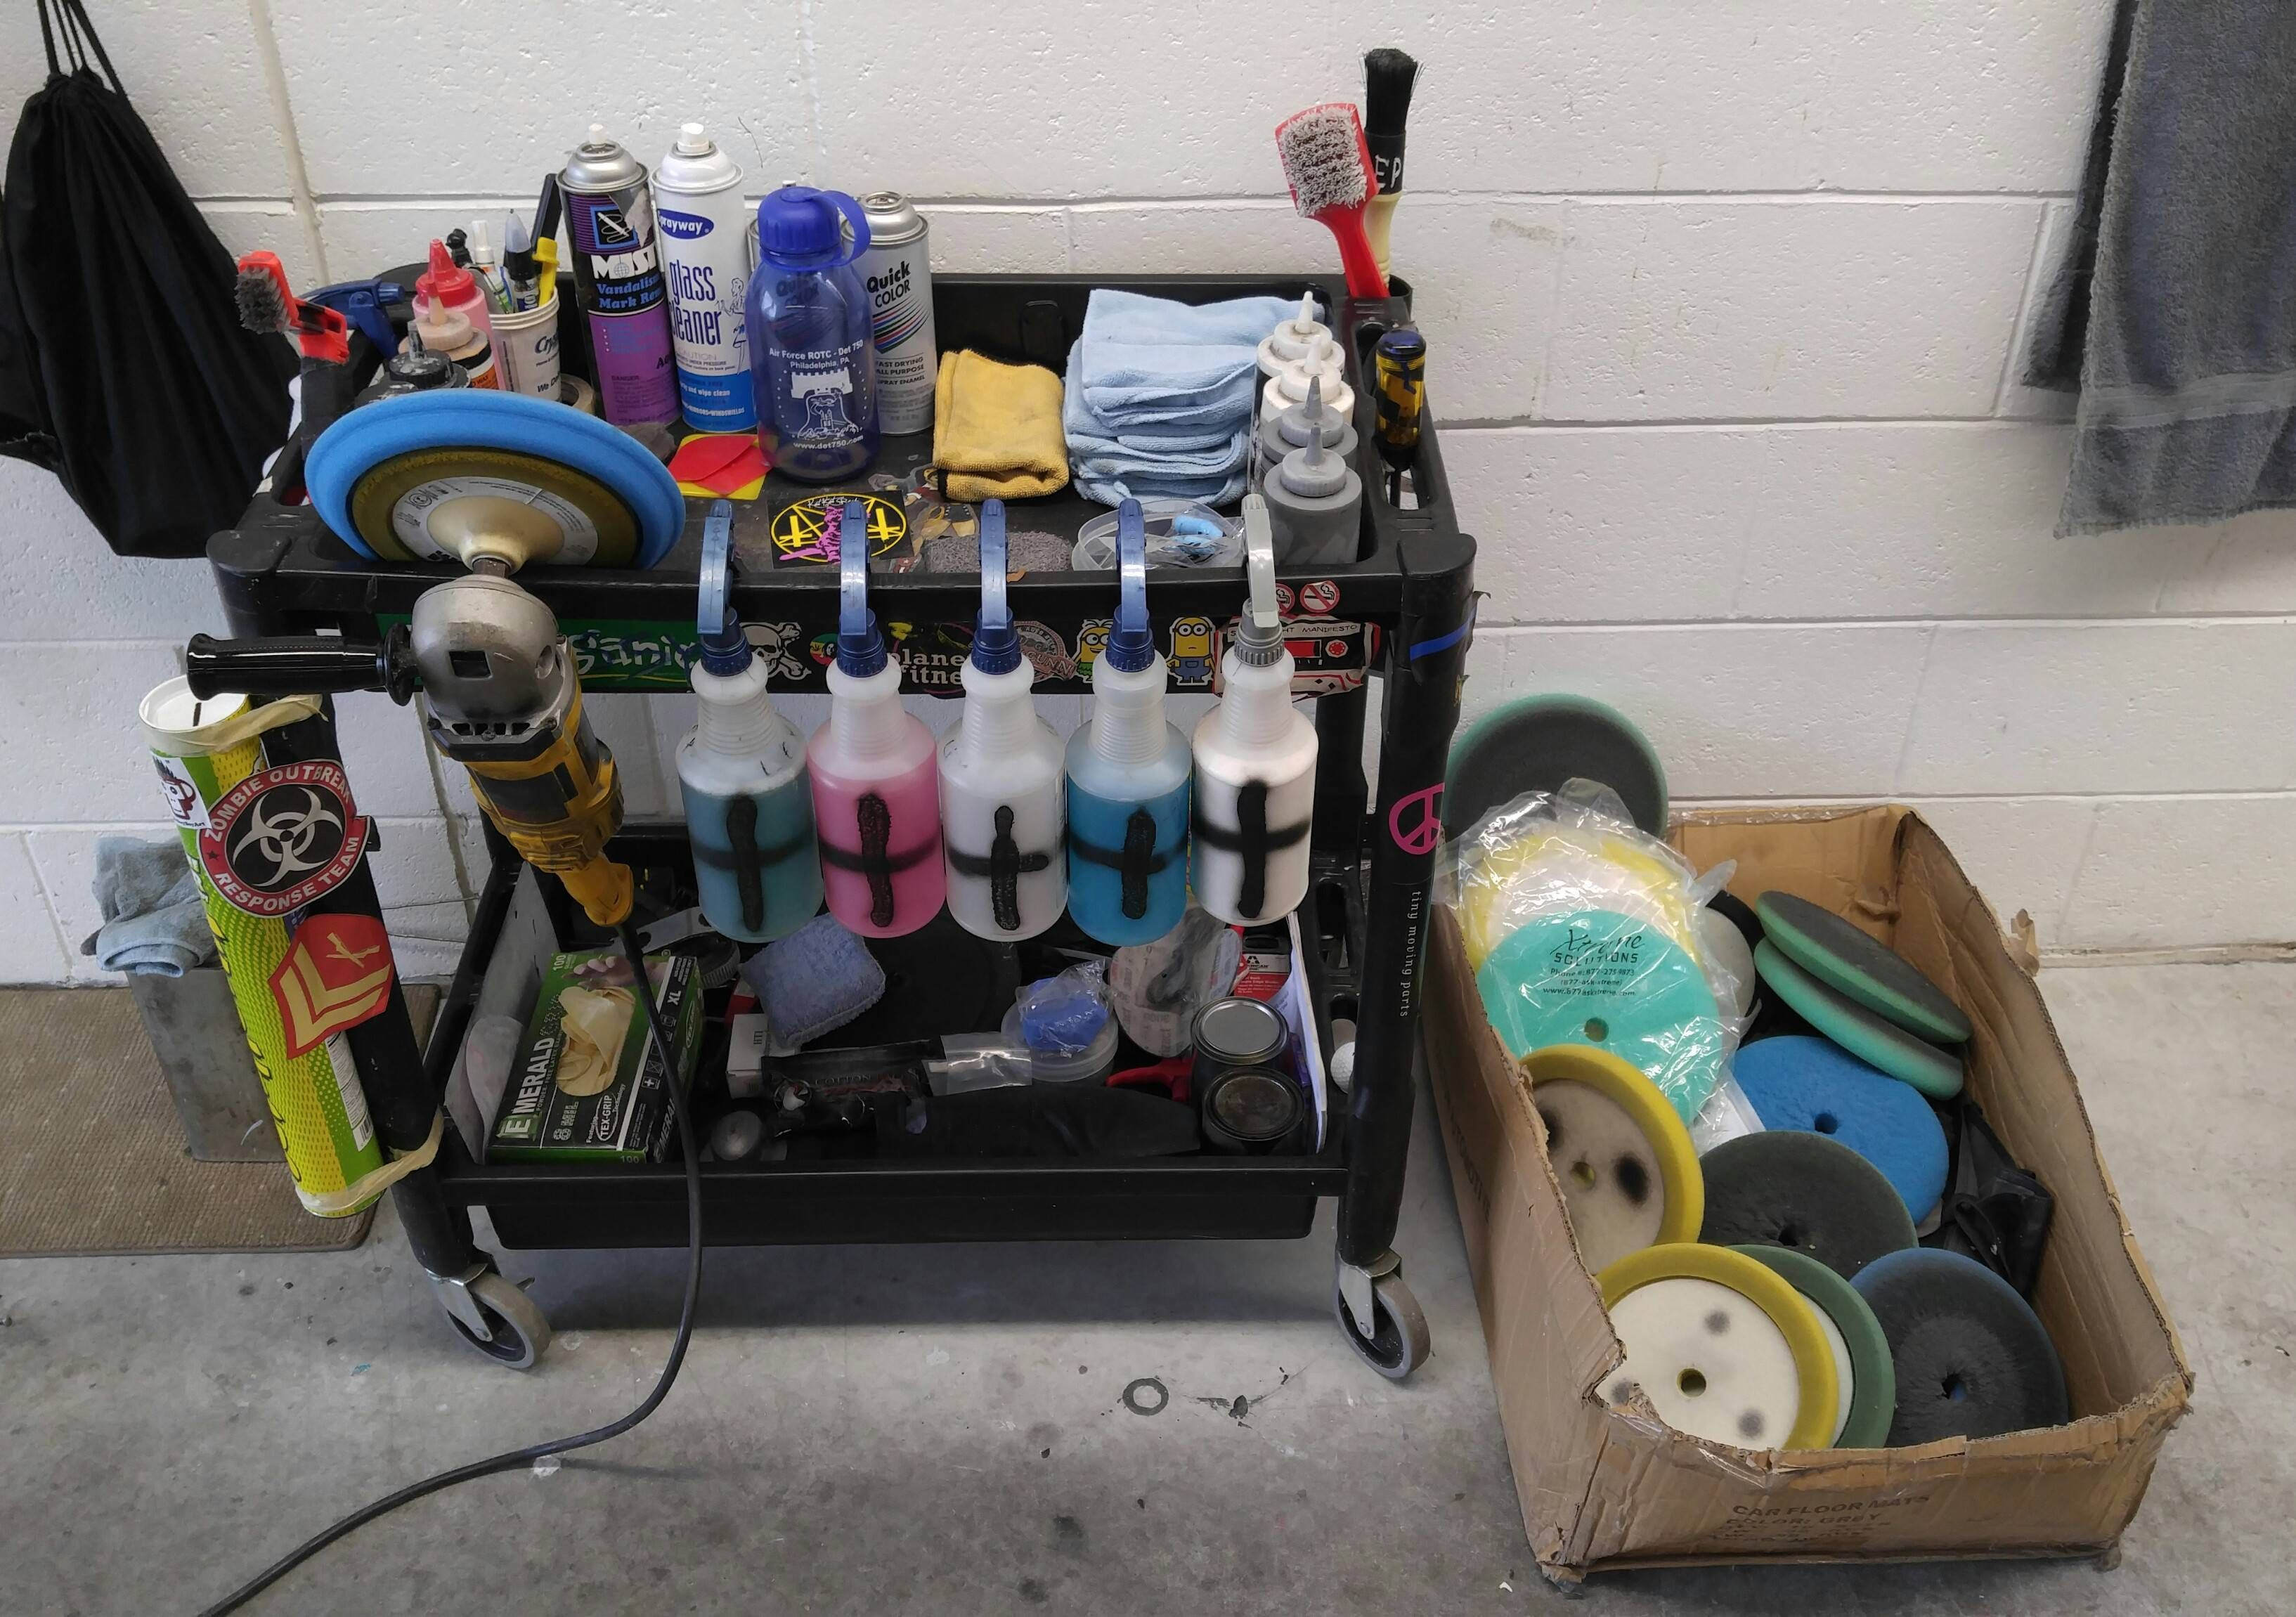 Clean cart happy detailer im a buffer at a high volume